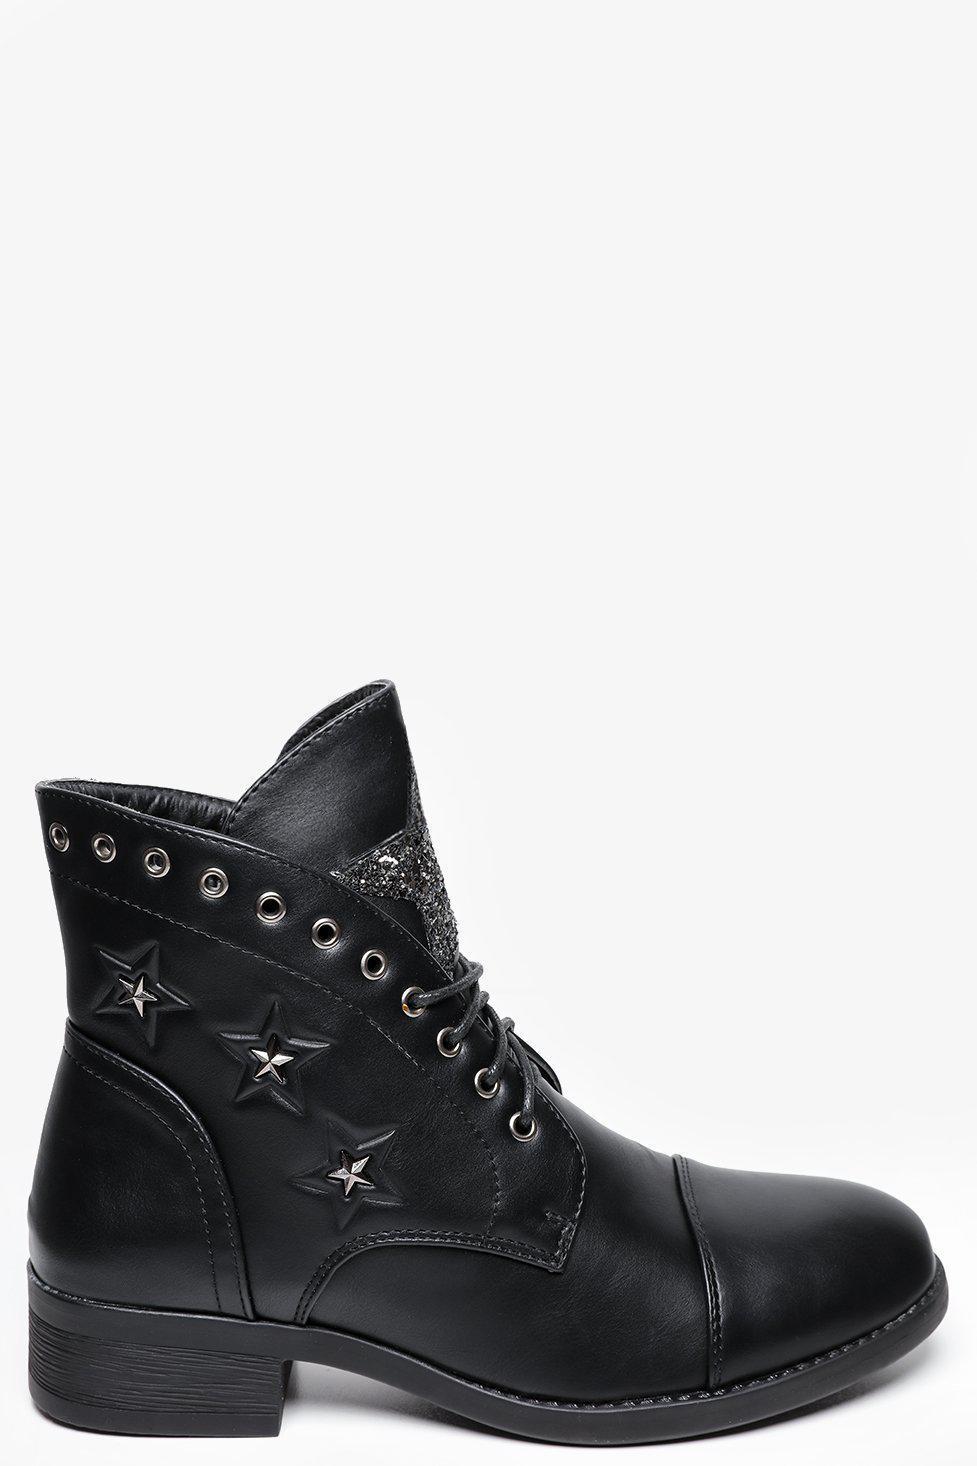 Glitter Star And Studs Black Boots